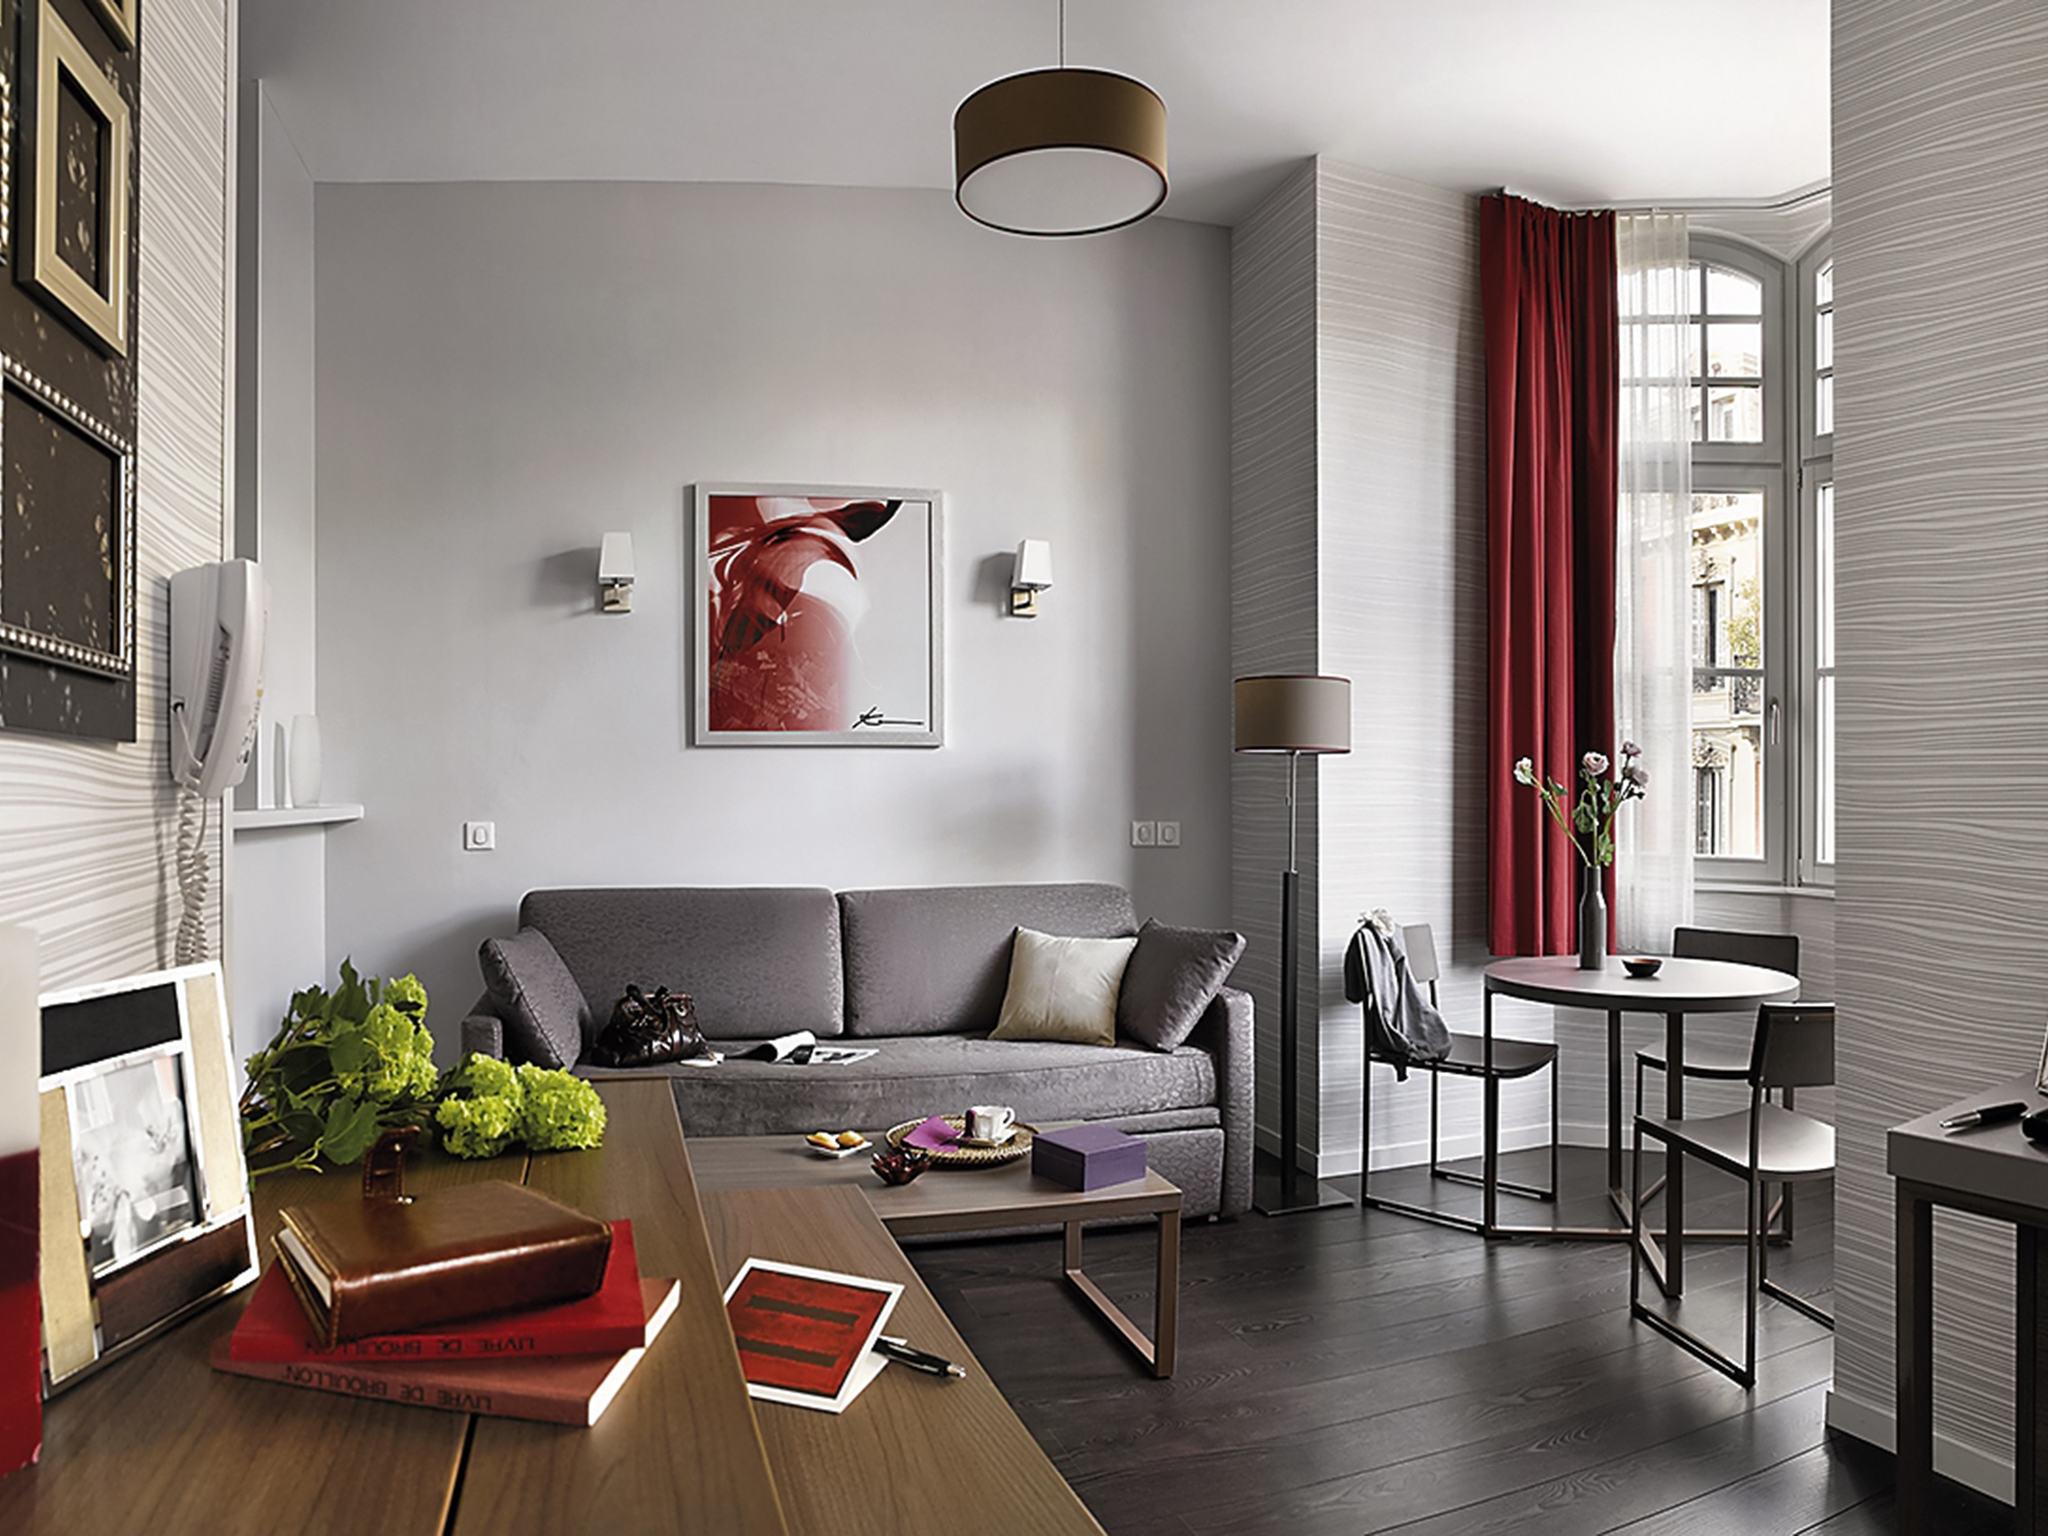 فندق - Aparthotel Adagio Strasbourg Place Kléber